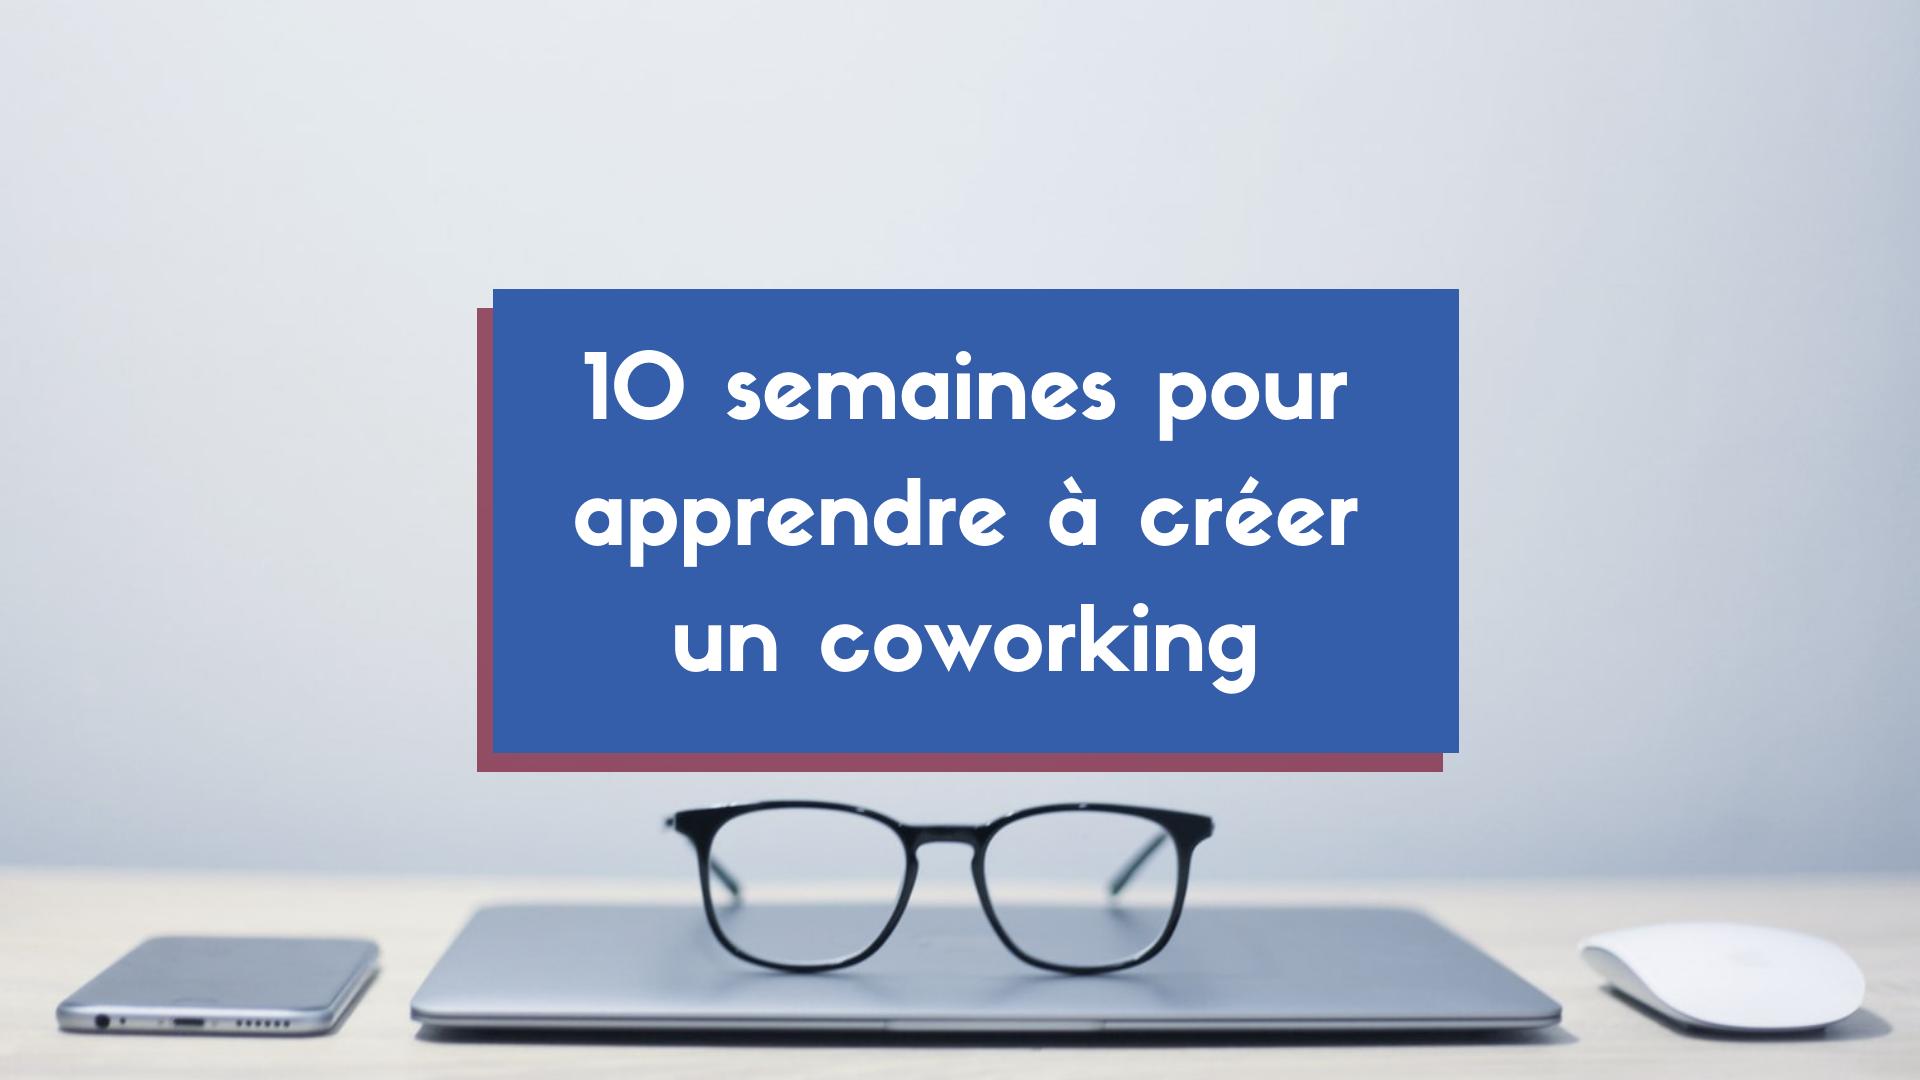 10 semaines pour ouvrir un coworking